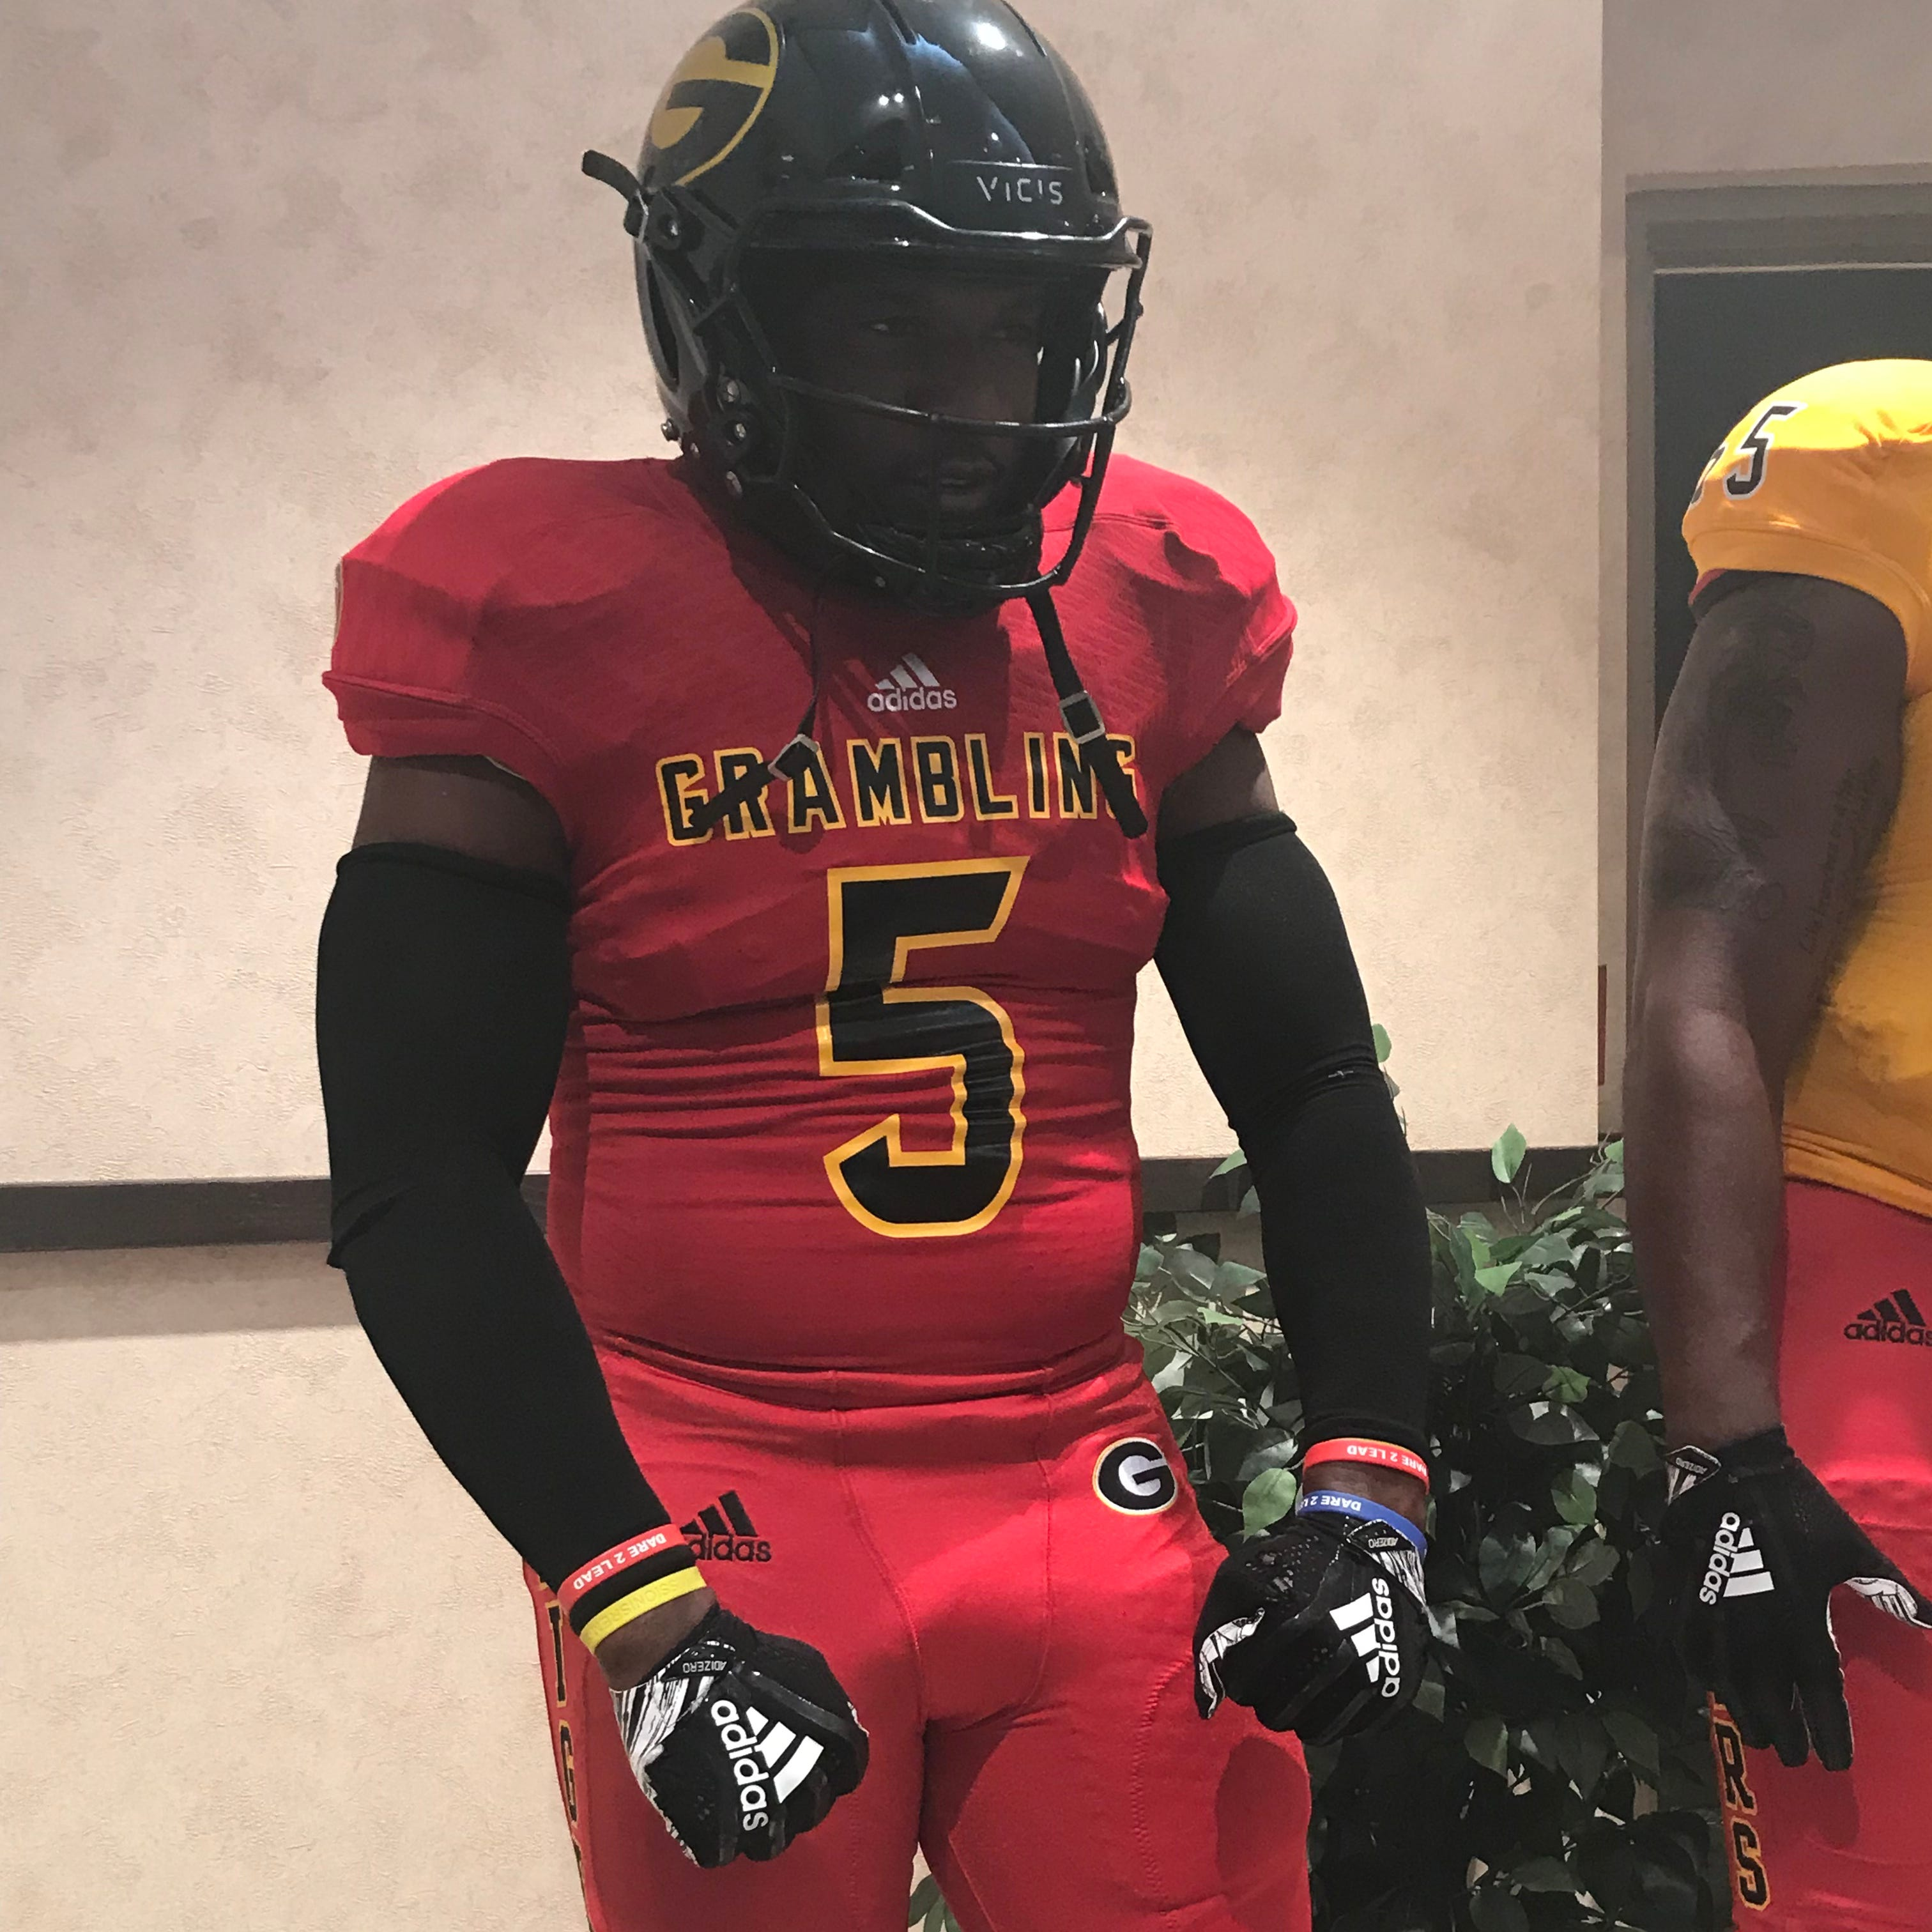 Grambling State unveils new adidas football uniforms